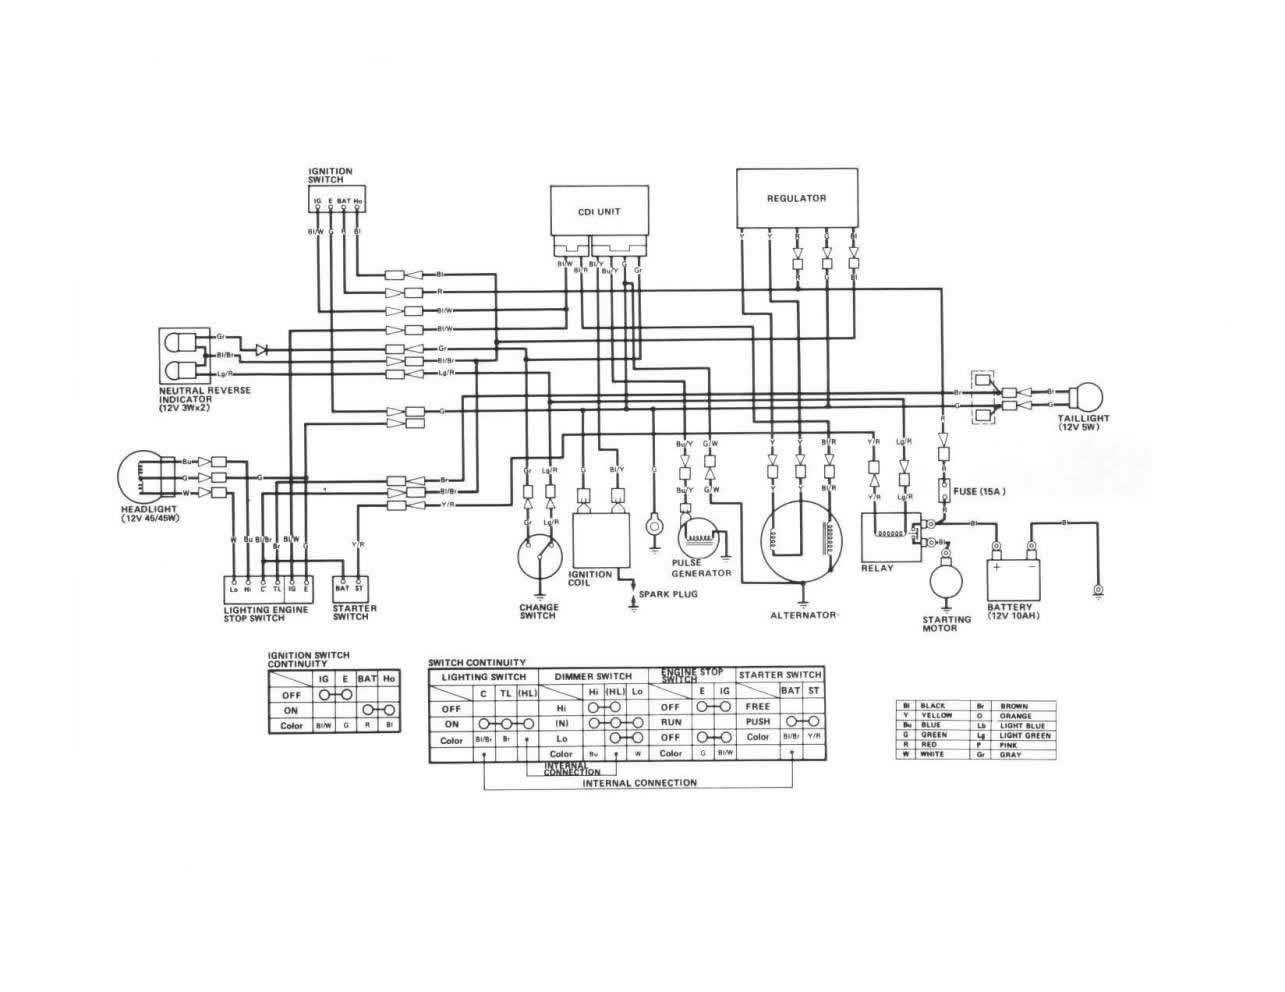 hight resolution of dinli wiring diagram also kreidler wiring diagram as well jawa 100 wiring diagrams